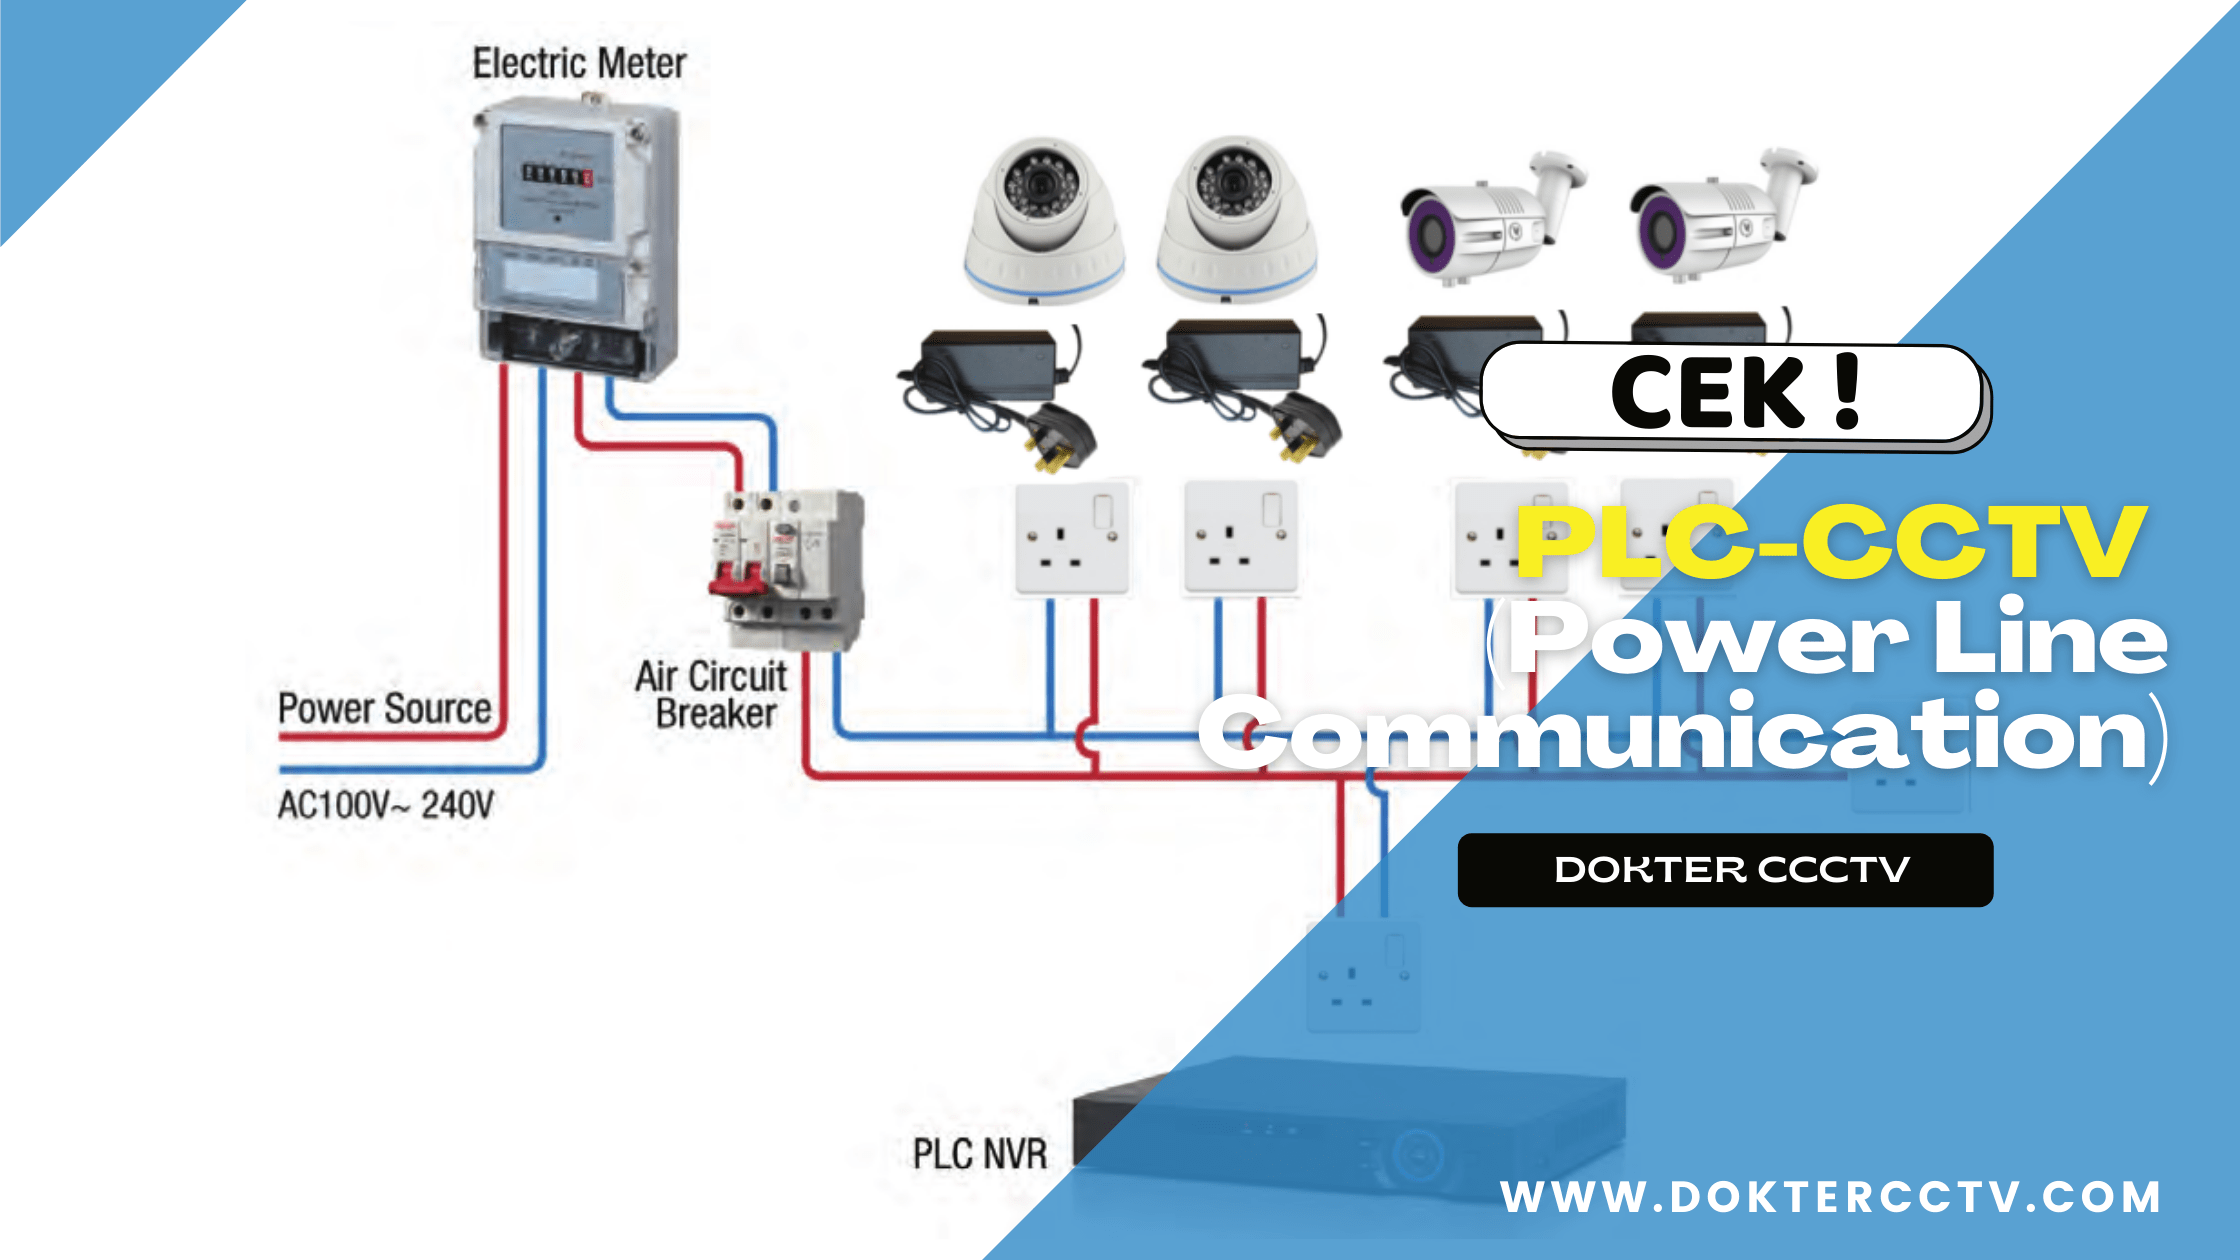 PLC-CCTV (Power Line Communication)